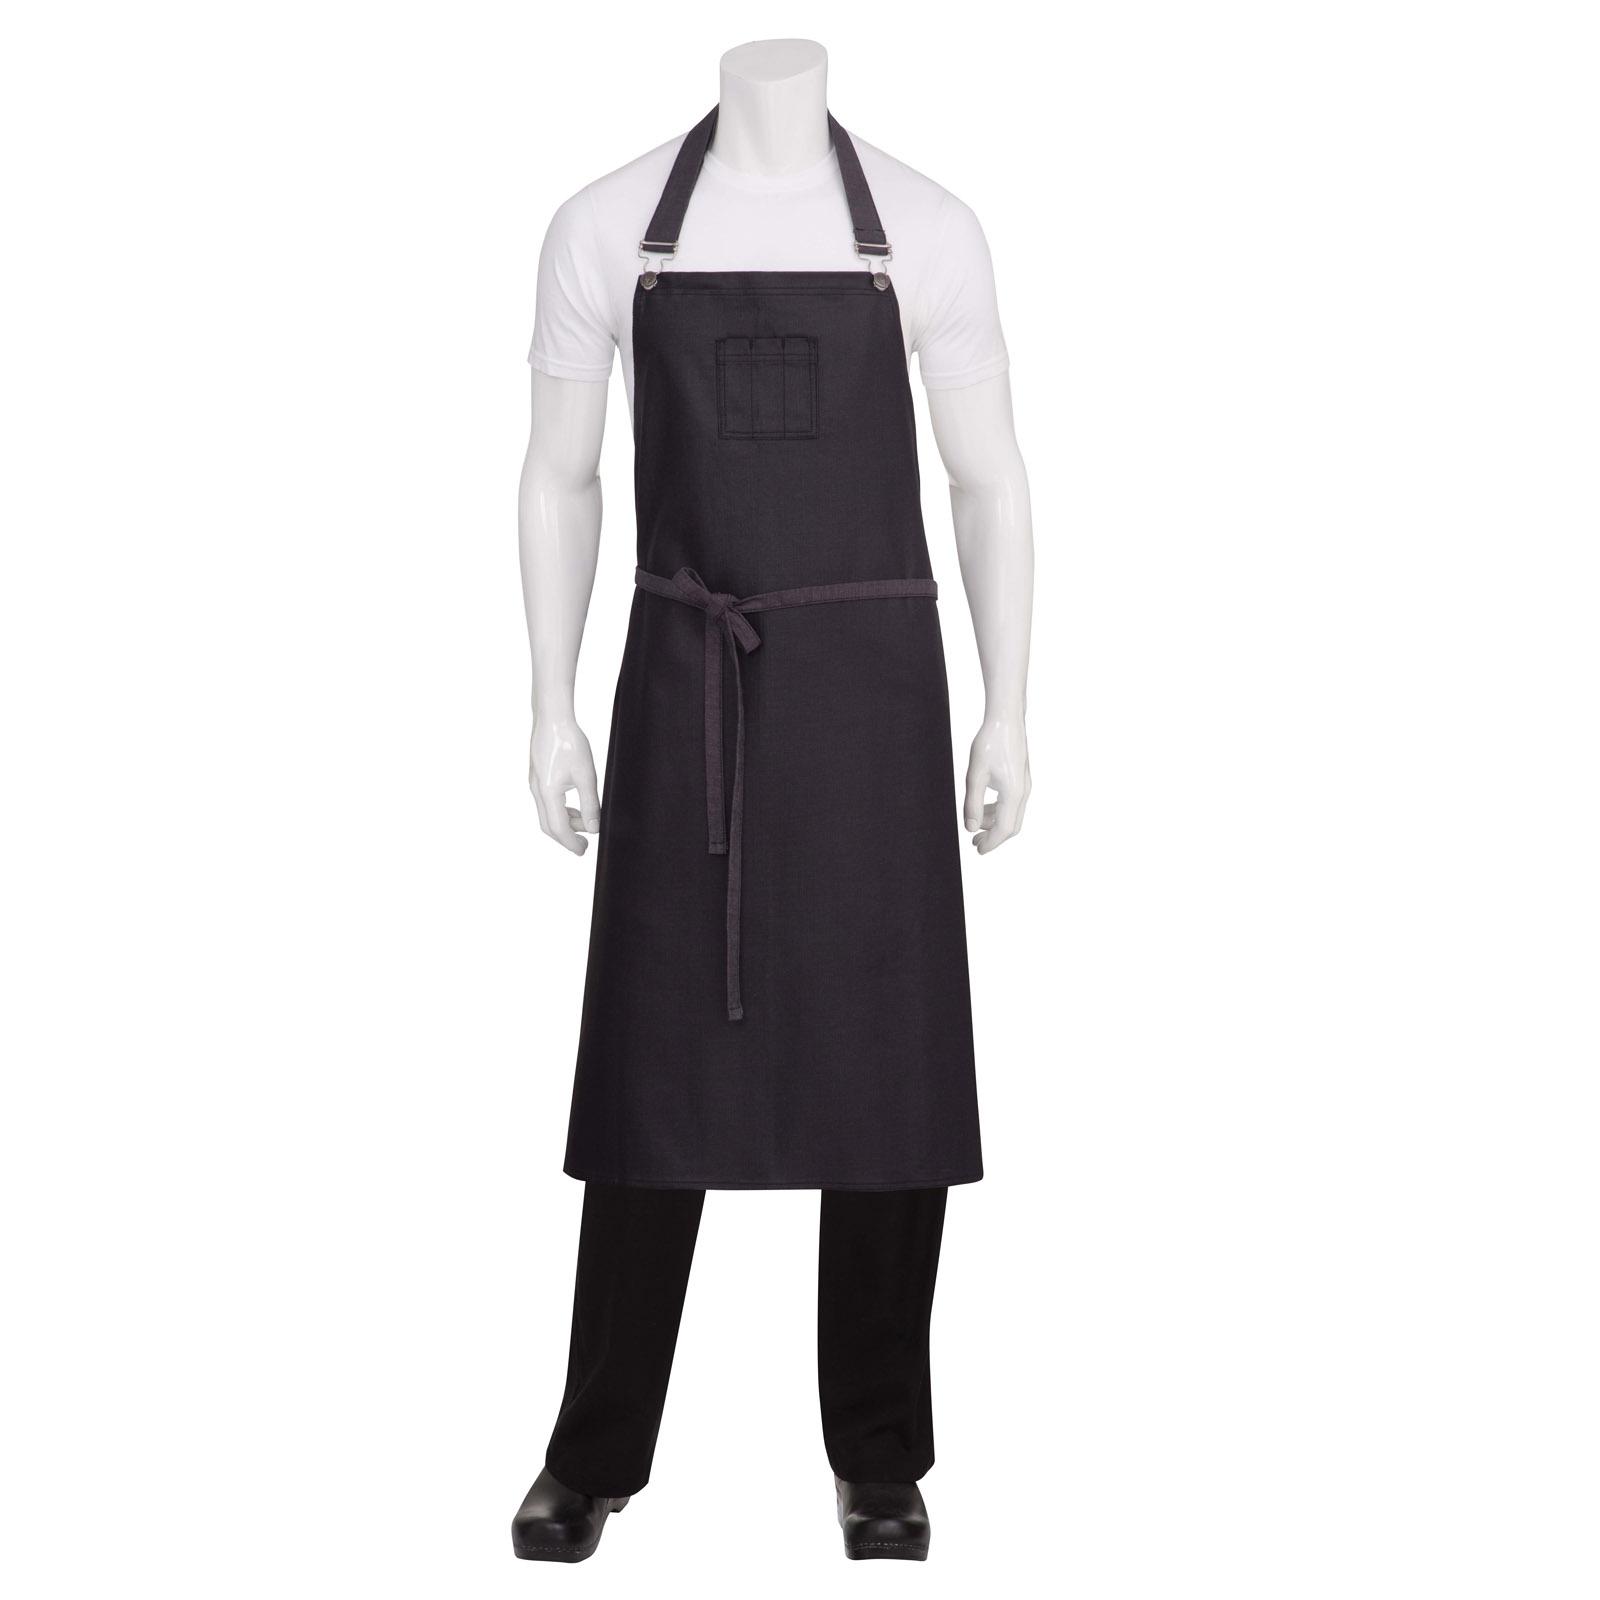 Chef Works ABCWT001PUB0 bib apron